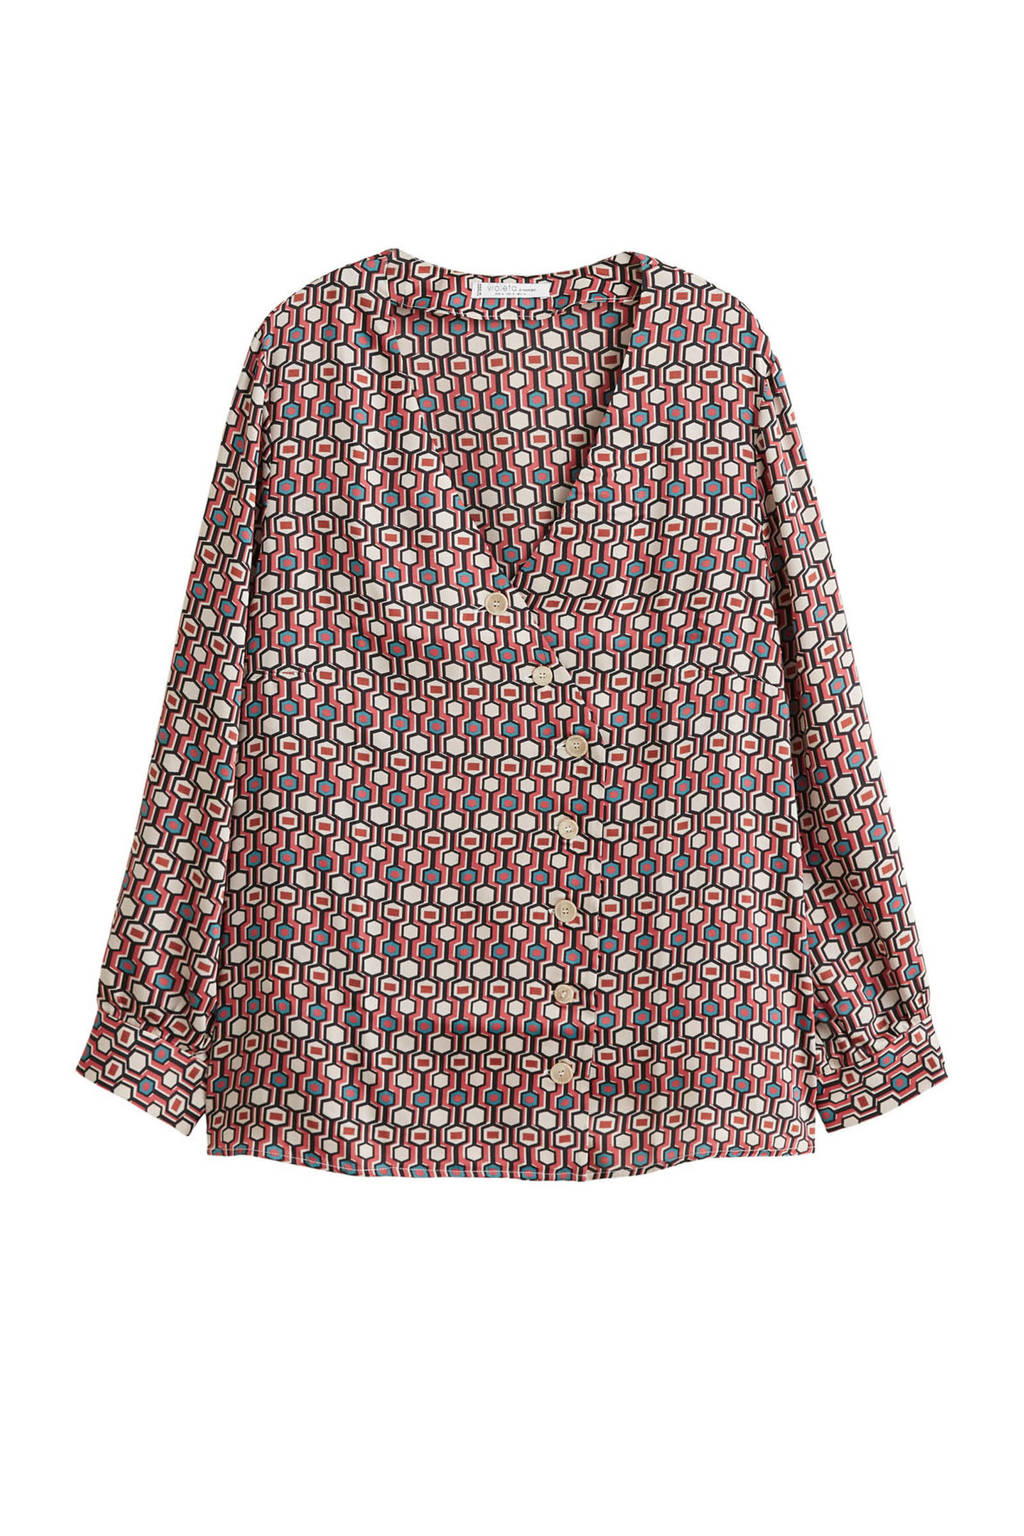 Violeta by Mango satijnen blouse met allover print, Bruin